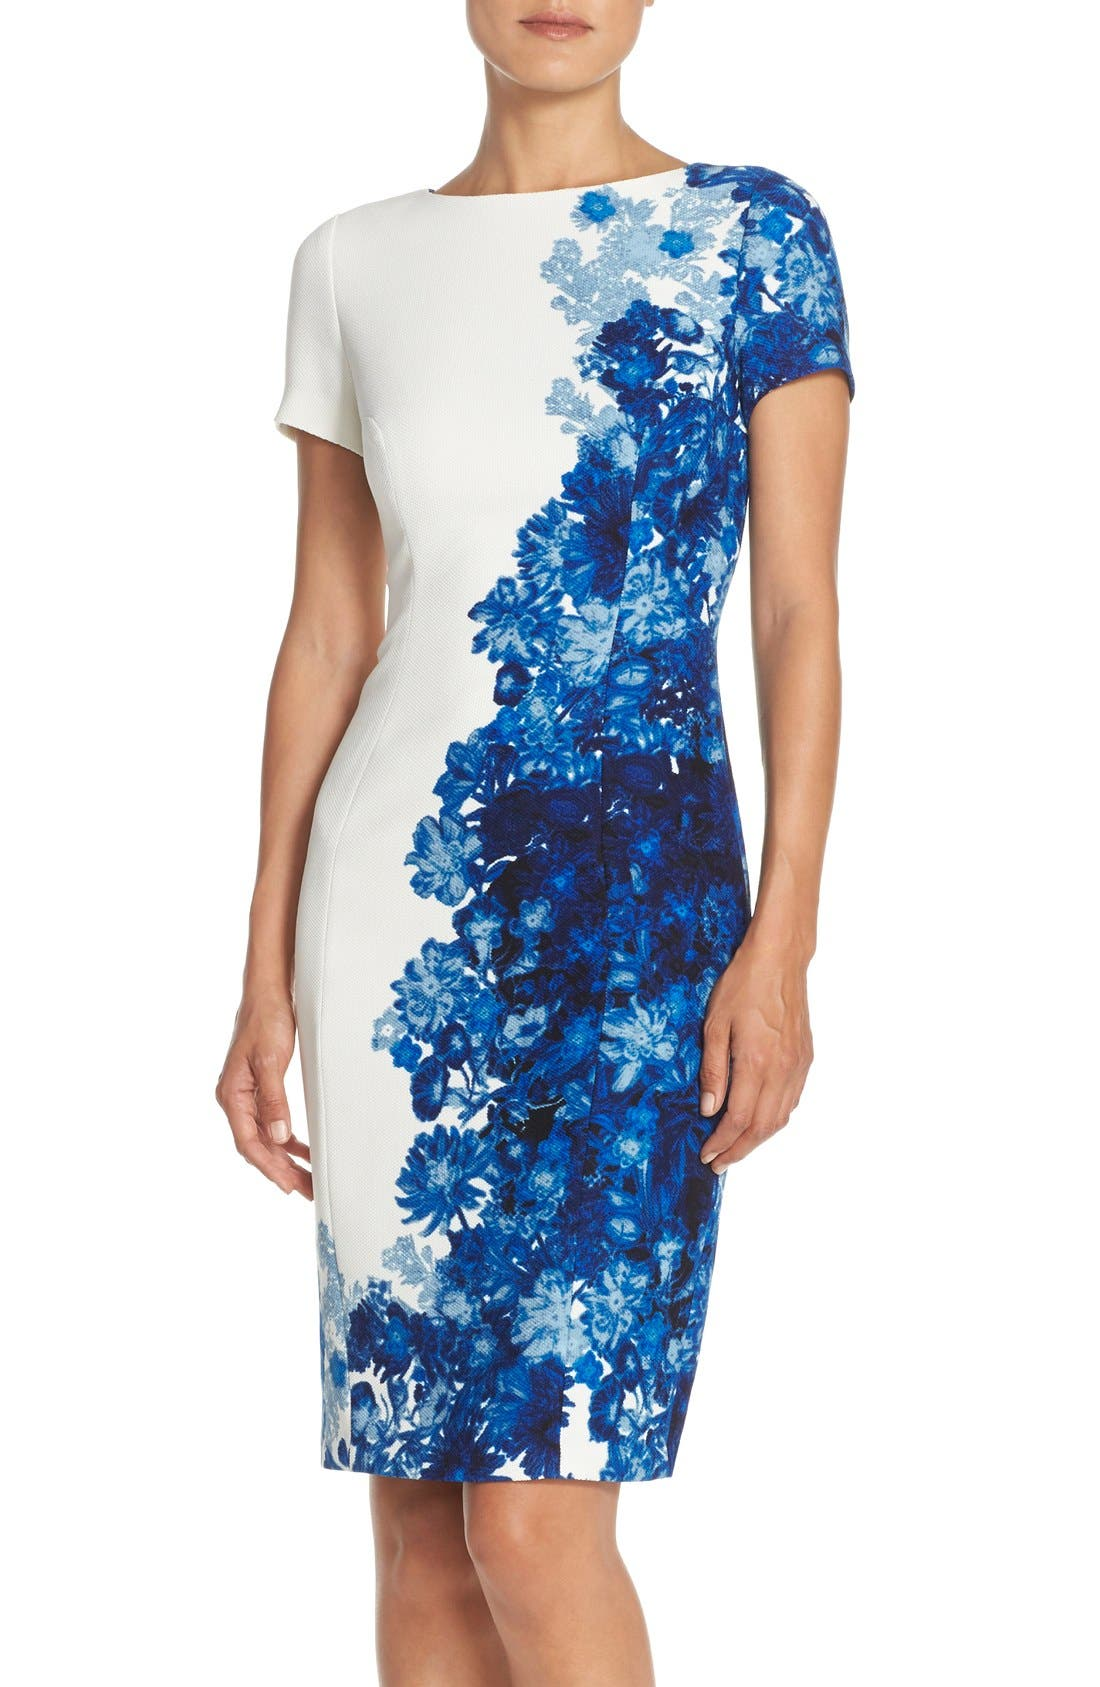 Main Image - Adrianna Papell Floral Print Waffle Piqué Sheath Dress (Regualr & Petite)